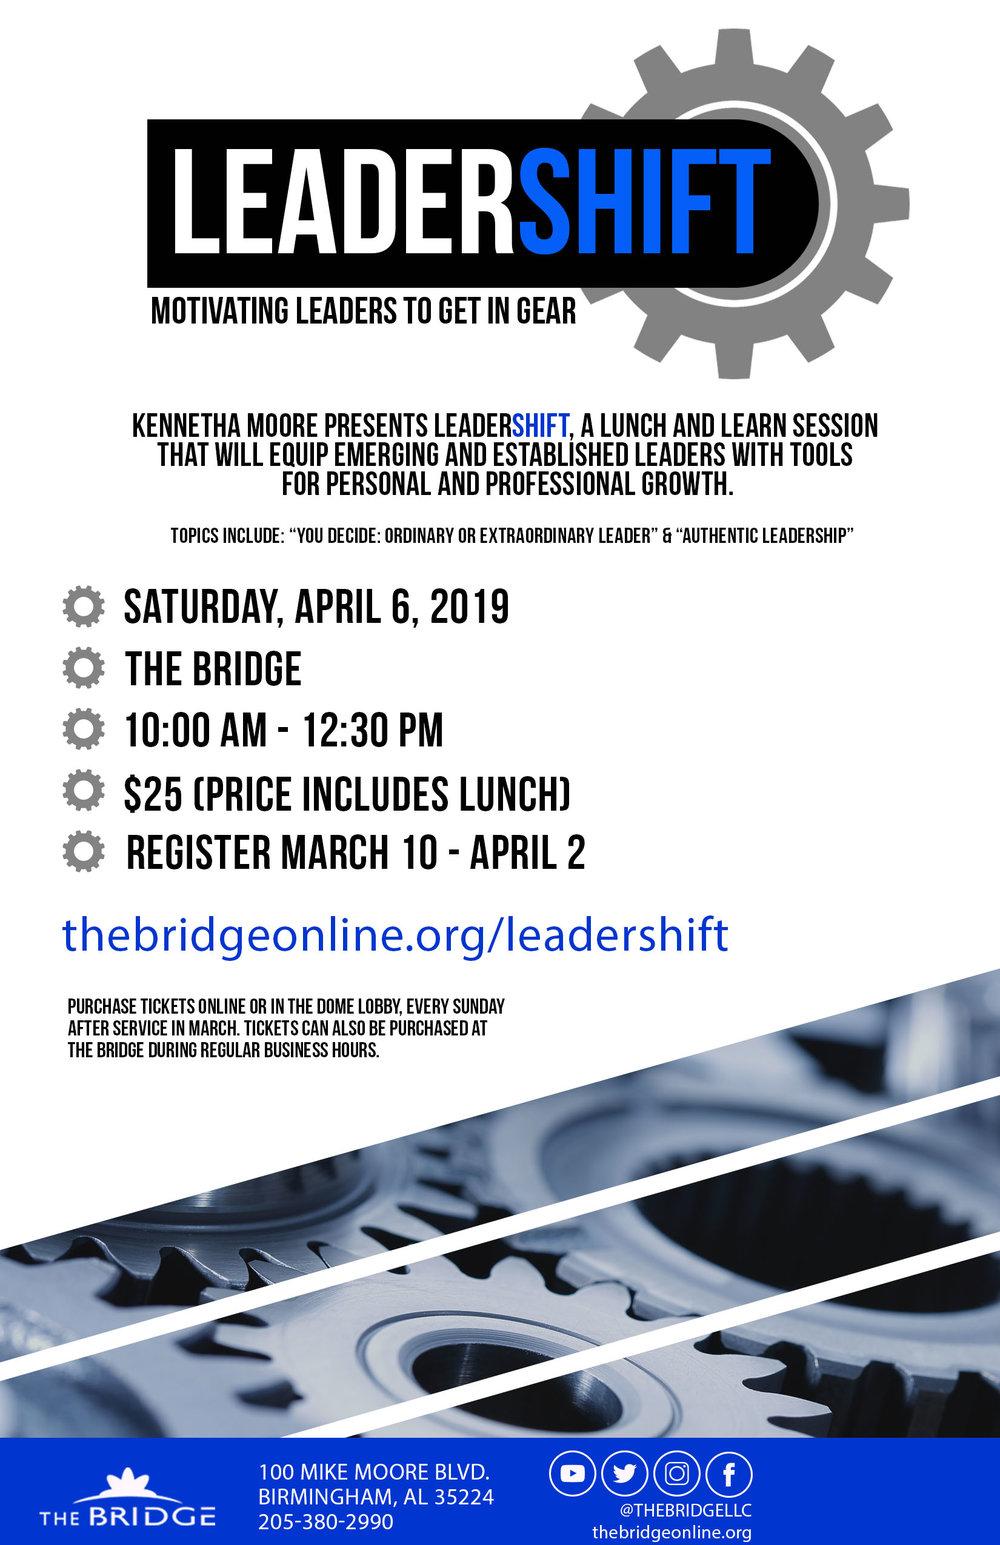 LeaderSHIFT flyer.jpg